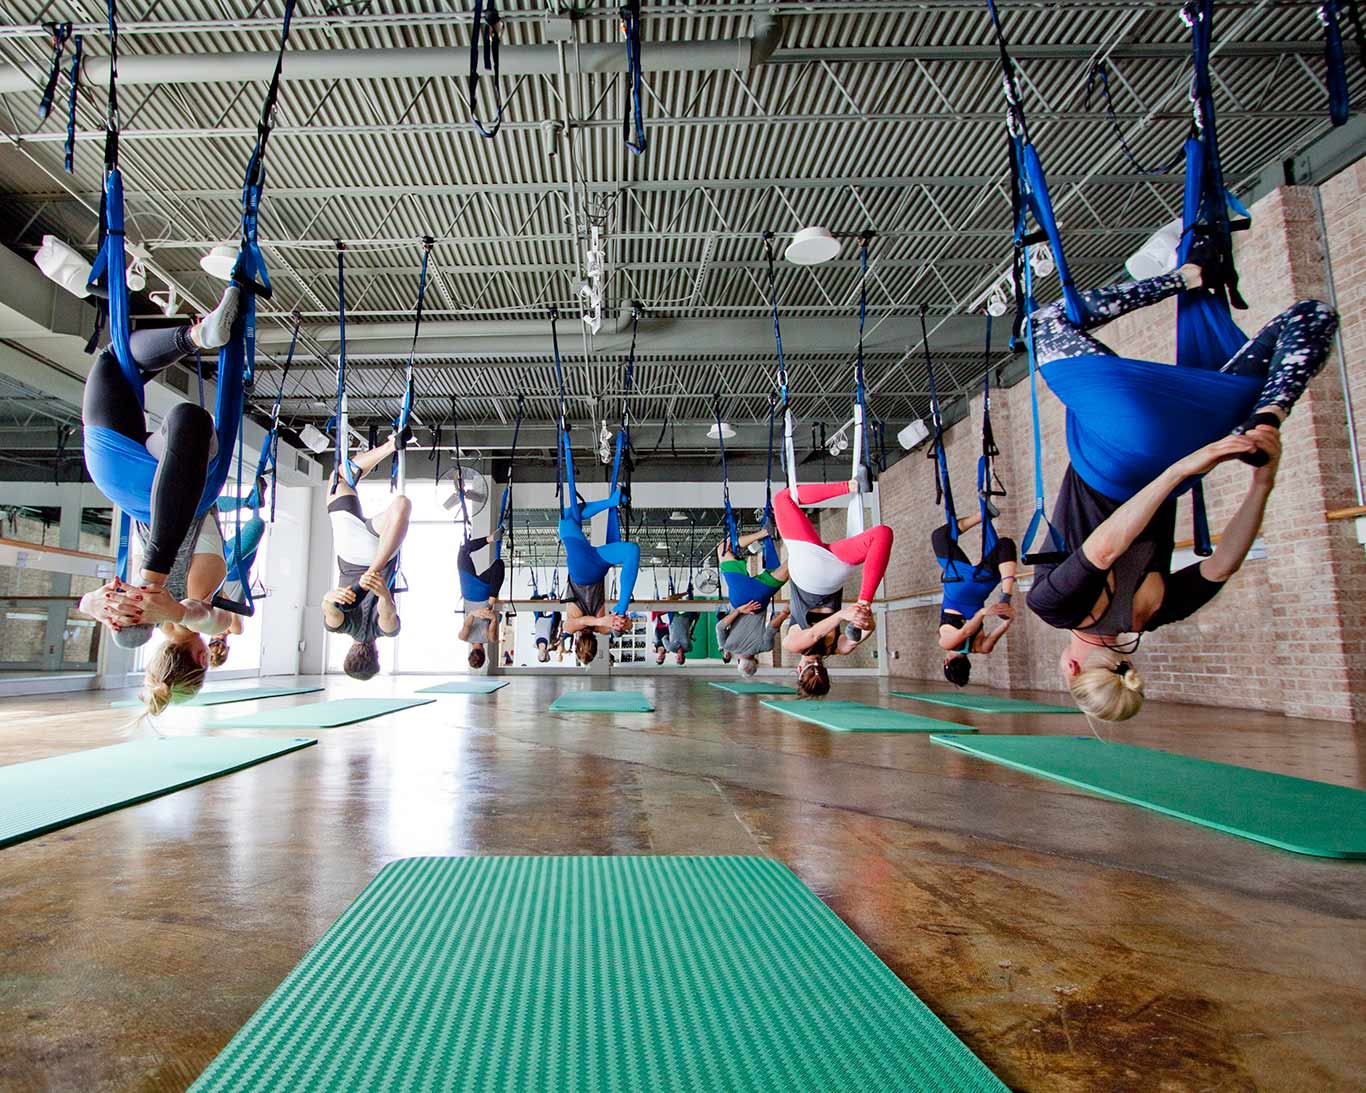 5 best austin yoga studios to bust a move blog   5 best austin yoga studios to bust a move  rh   austincraftrealty